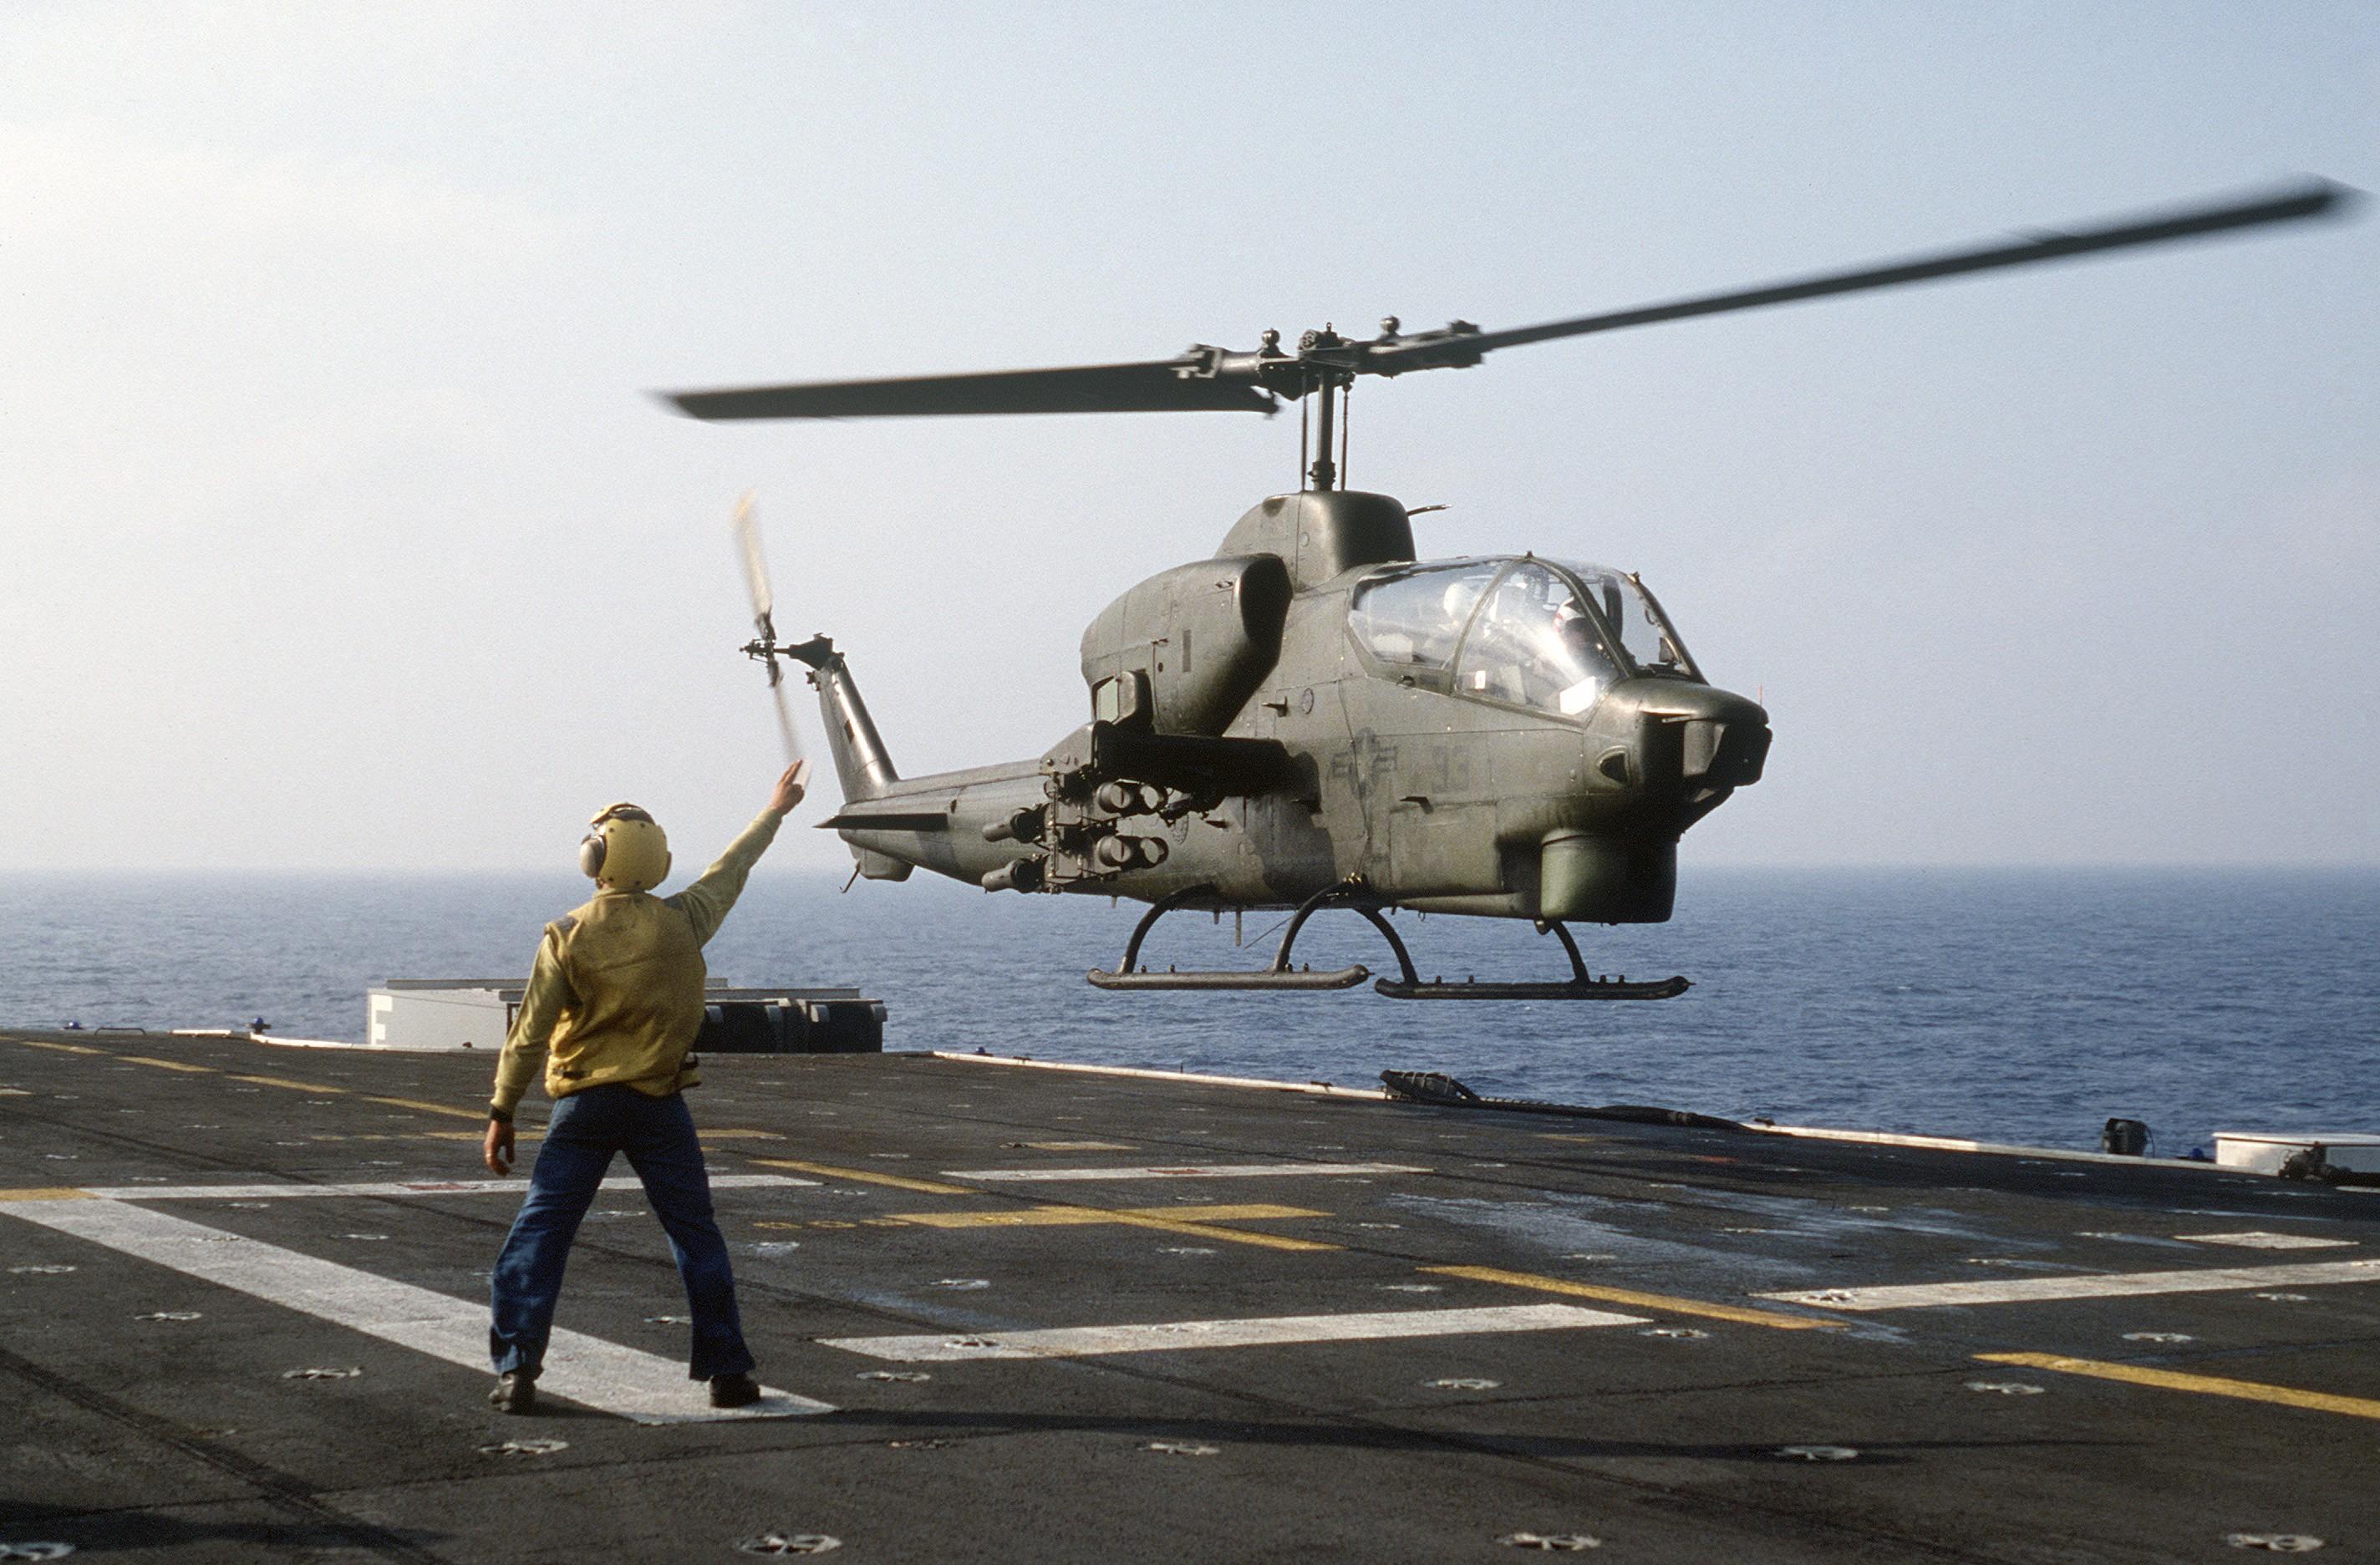 File:AH-1J-1.jpg - Wikimedia Commons Ah